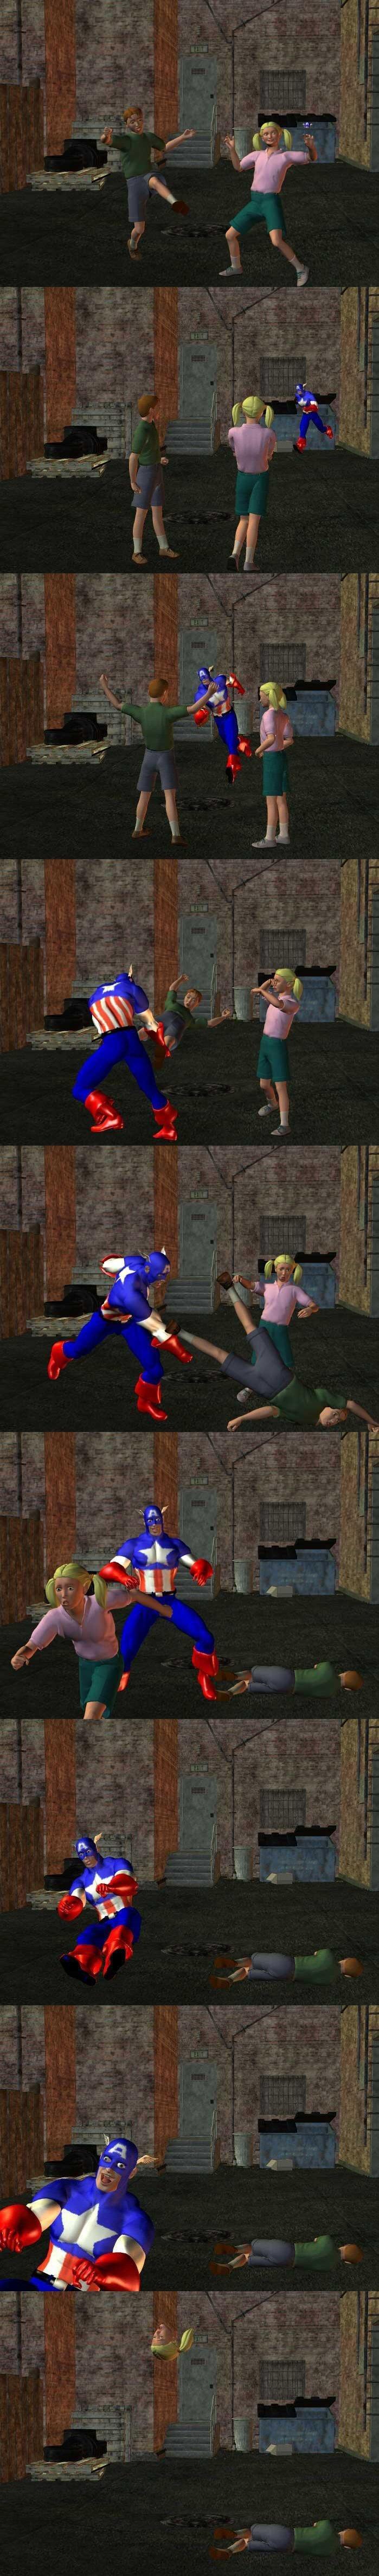 Captain America to the rescue.. . choo choo motherfucker